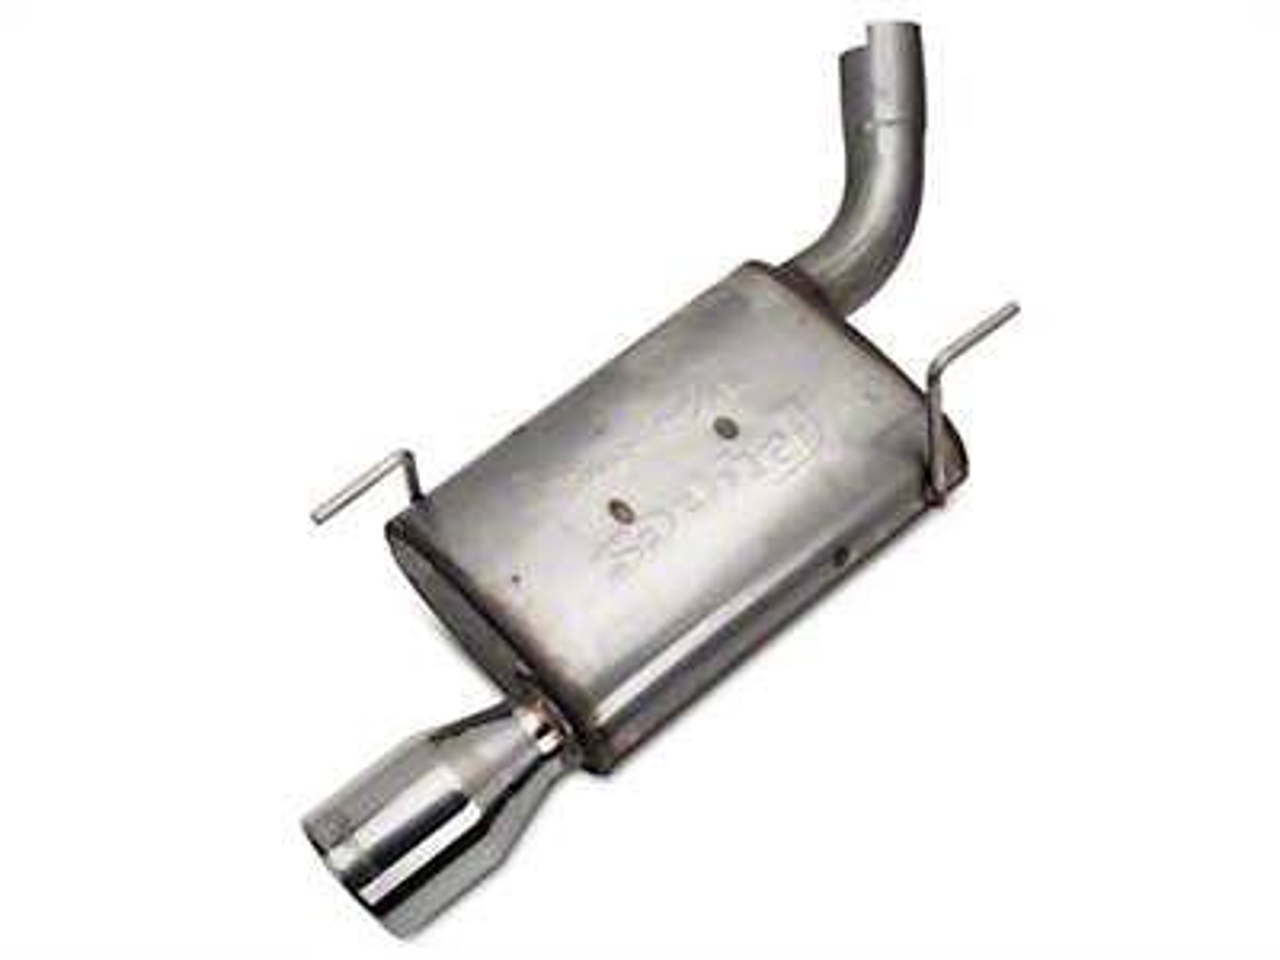 Pypes Street-Pro Axle-Back Exhaust (05-10 V6)